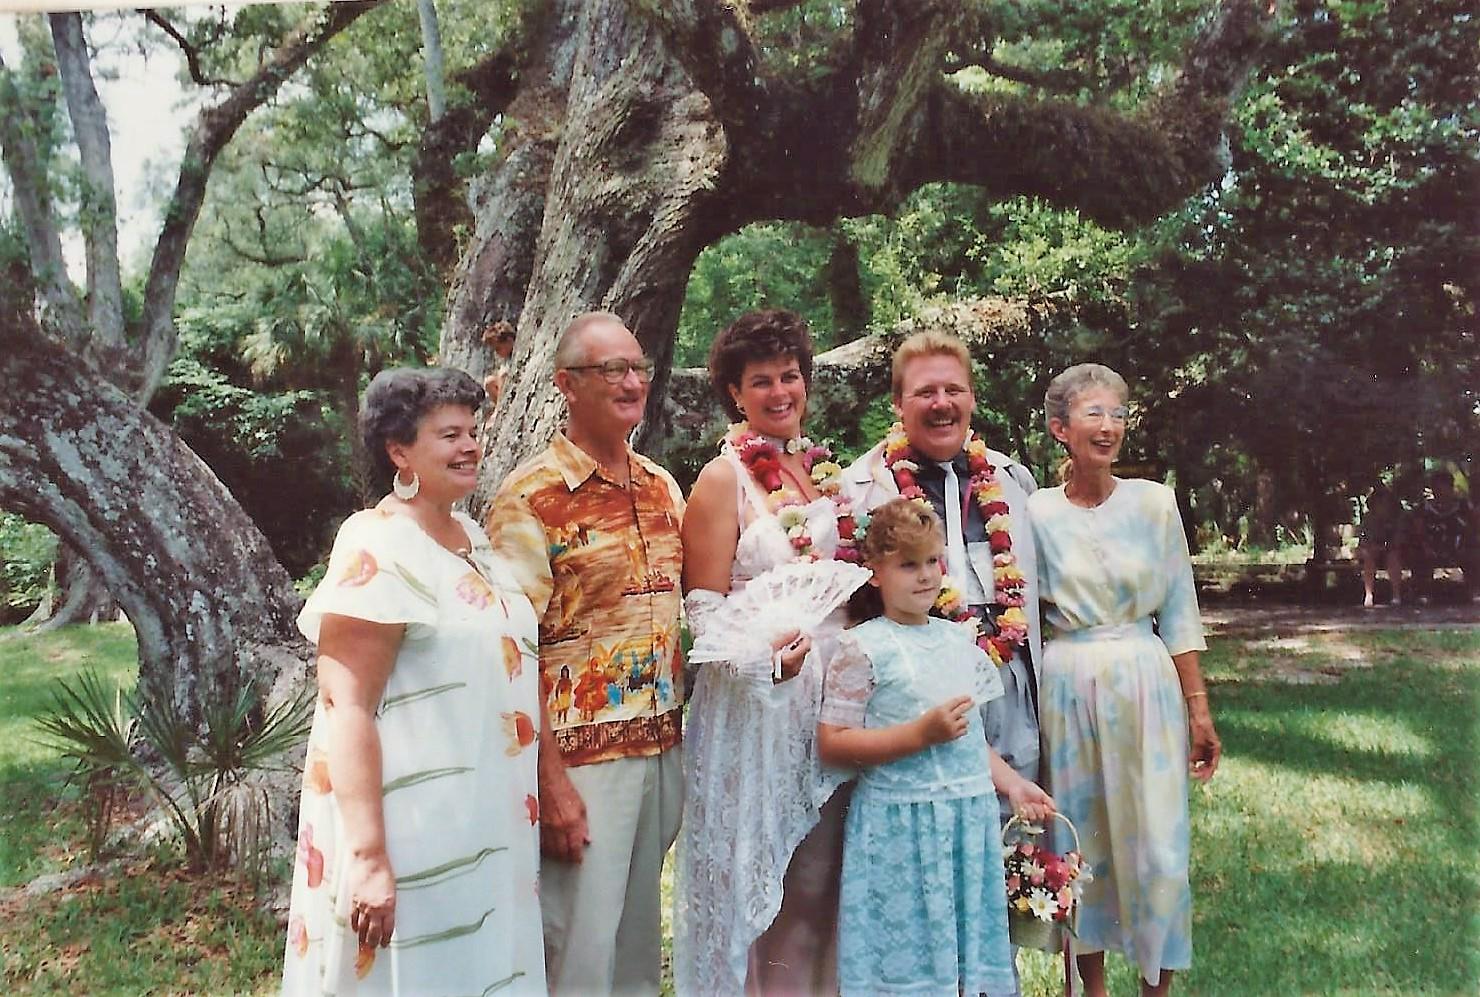 Kevin & Linda' Wedding with Moms, Dad & Ashley